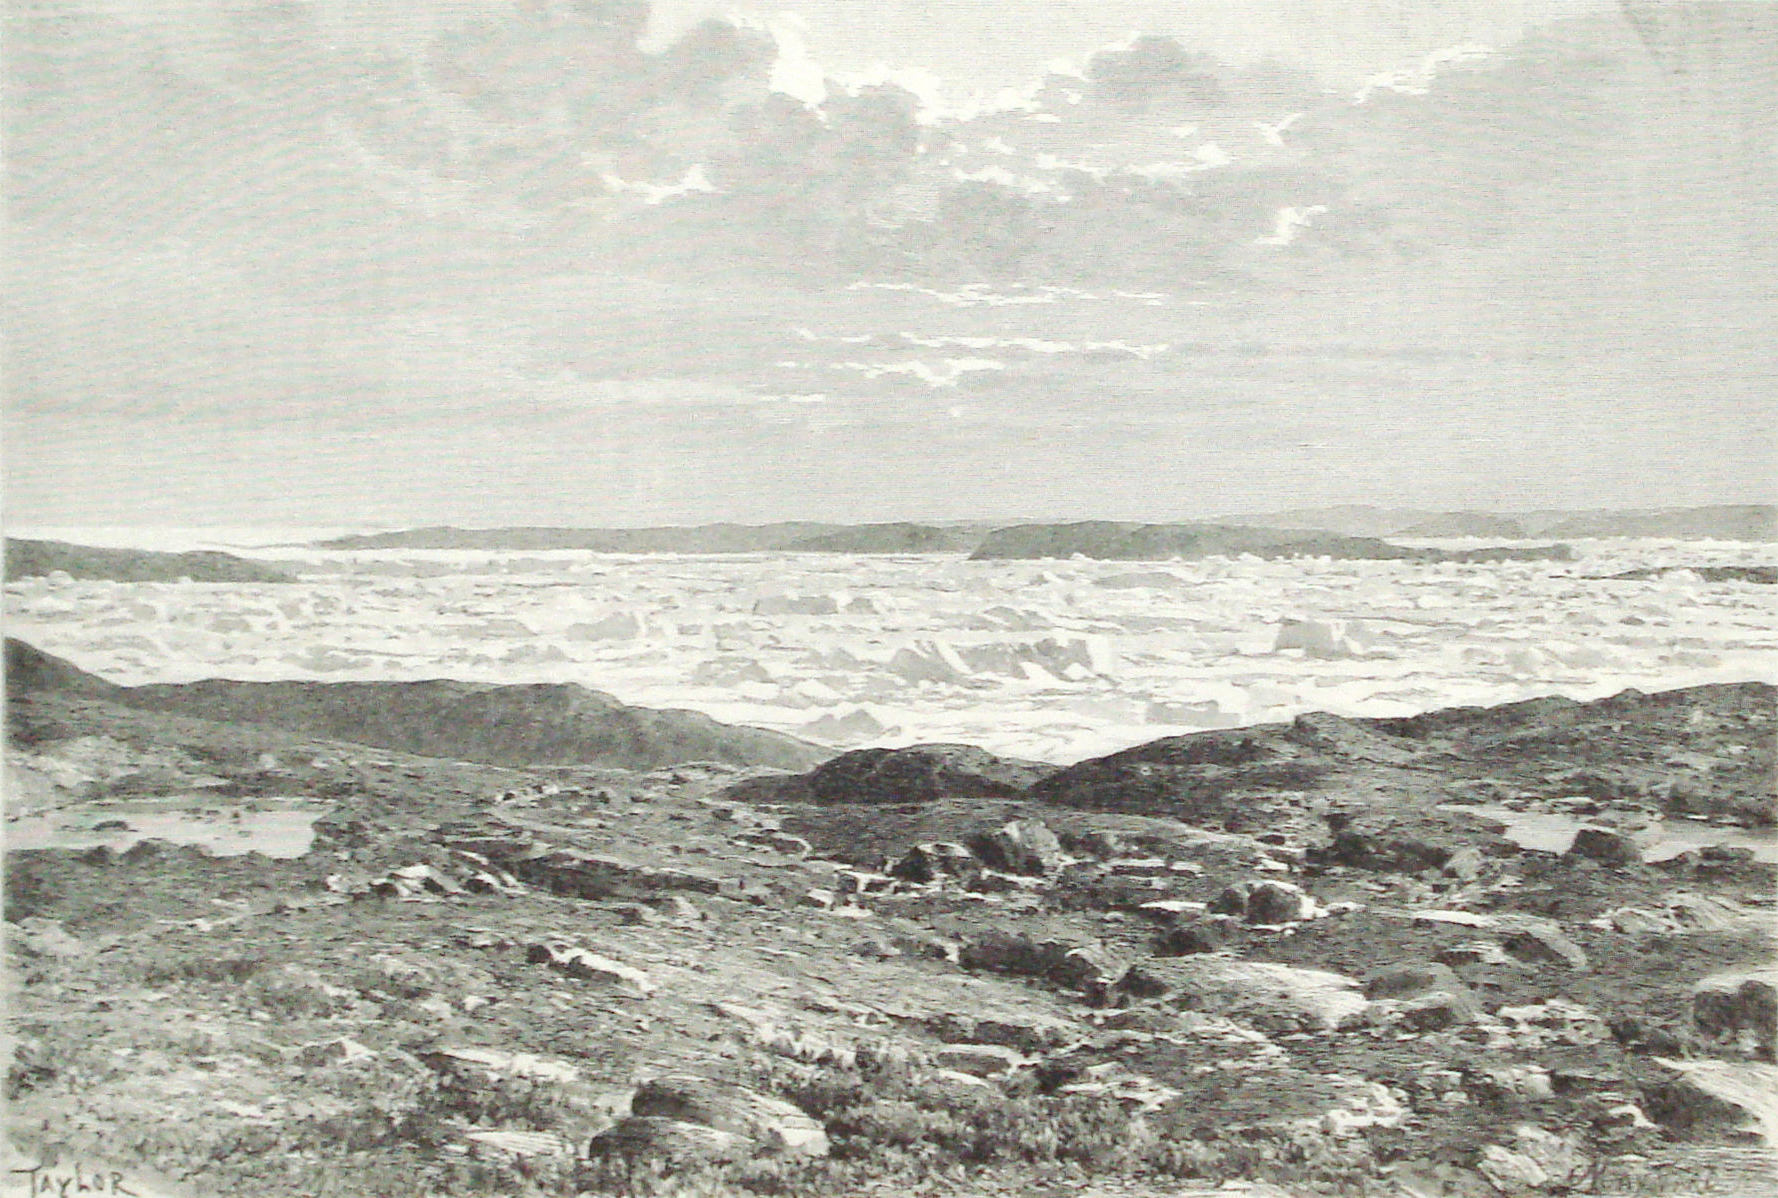 1890 print, Jakobshavn Glacier, Greenland, Denmark - Victorian, Sermeq Kujalleq - 127 yr French antique engraving illustration